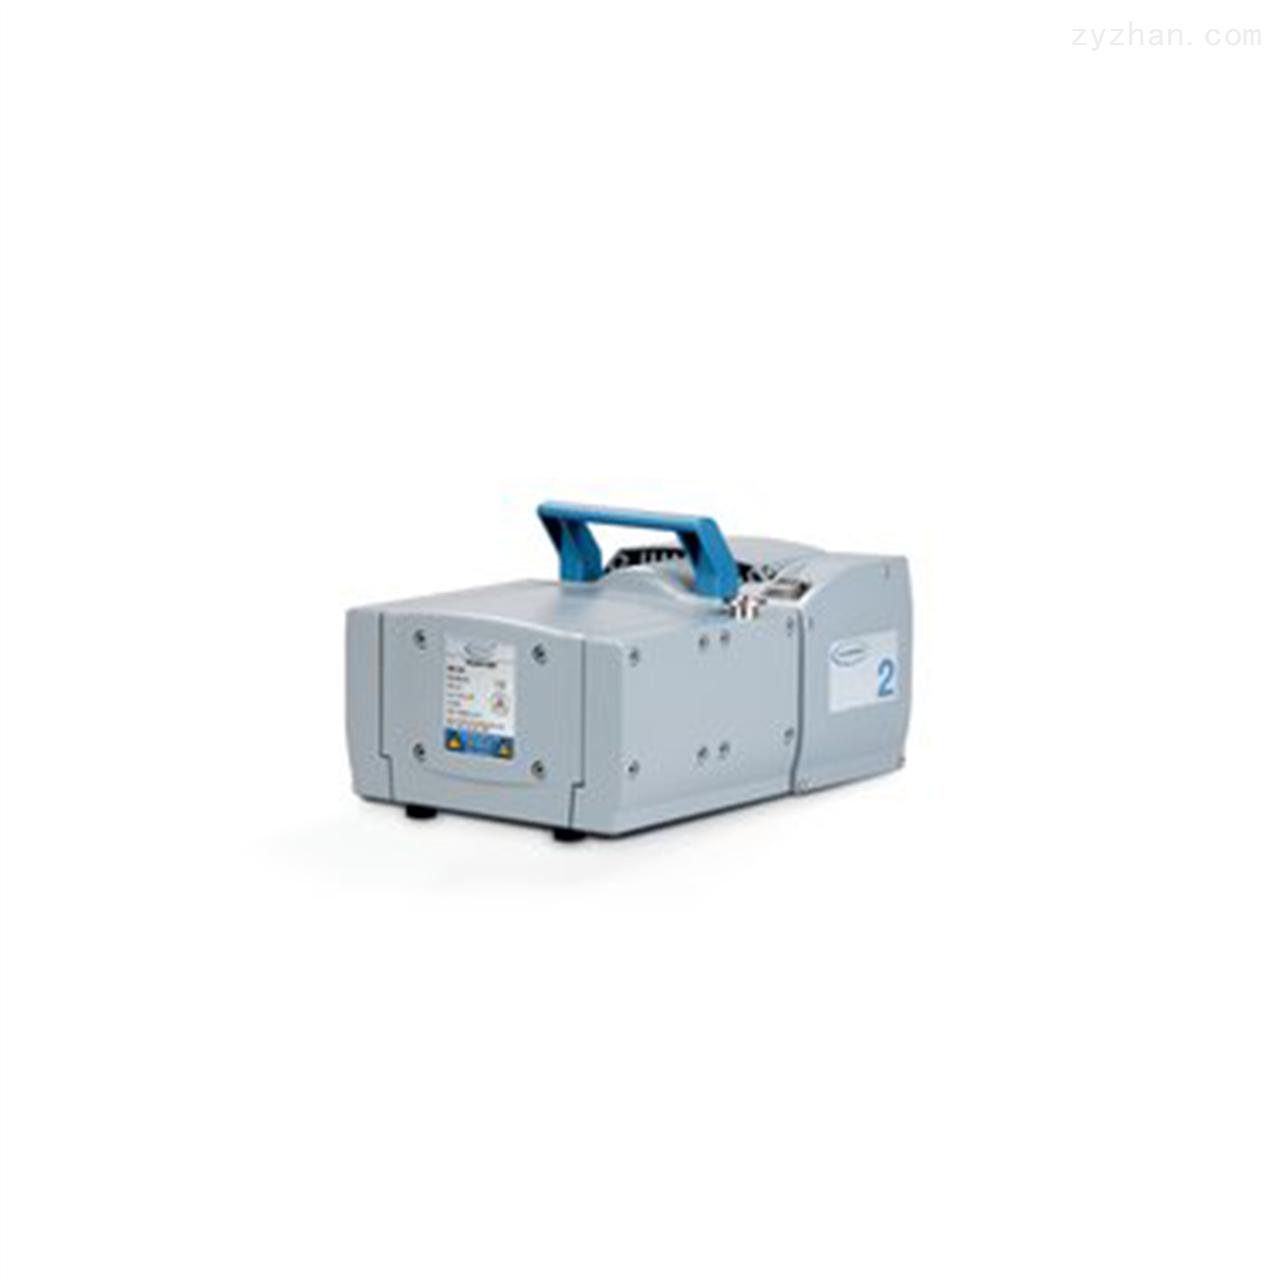 VACUUBRAND 0.3mbar隔膜泵 MV 2 NT